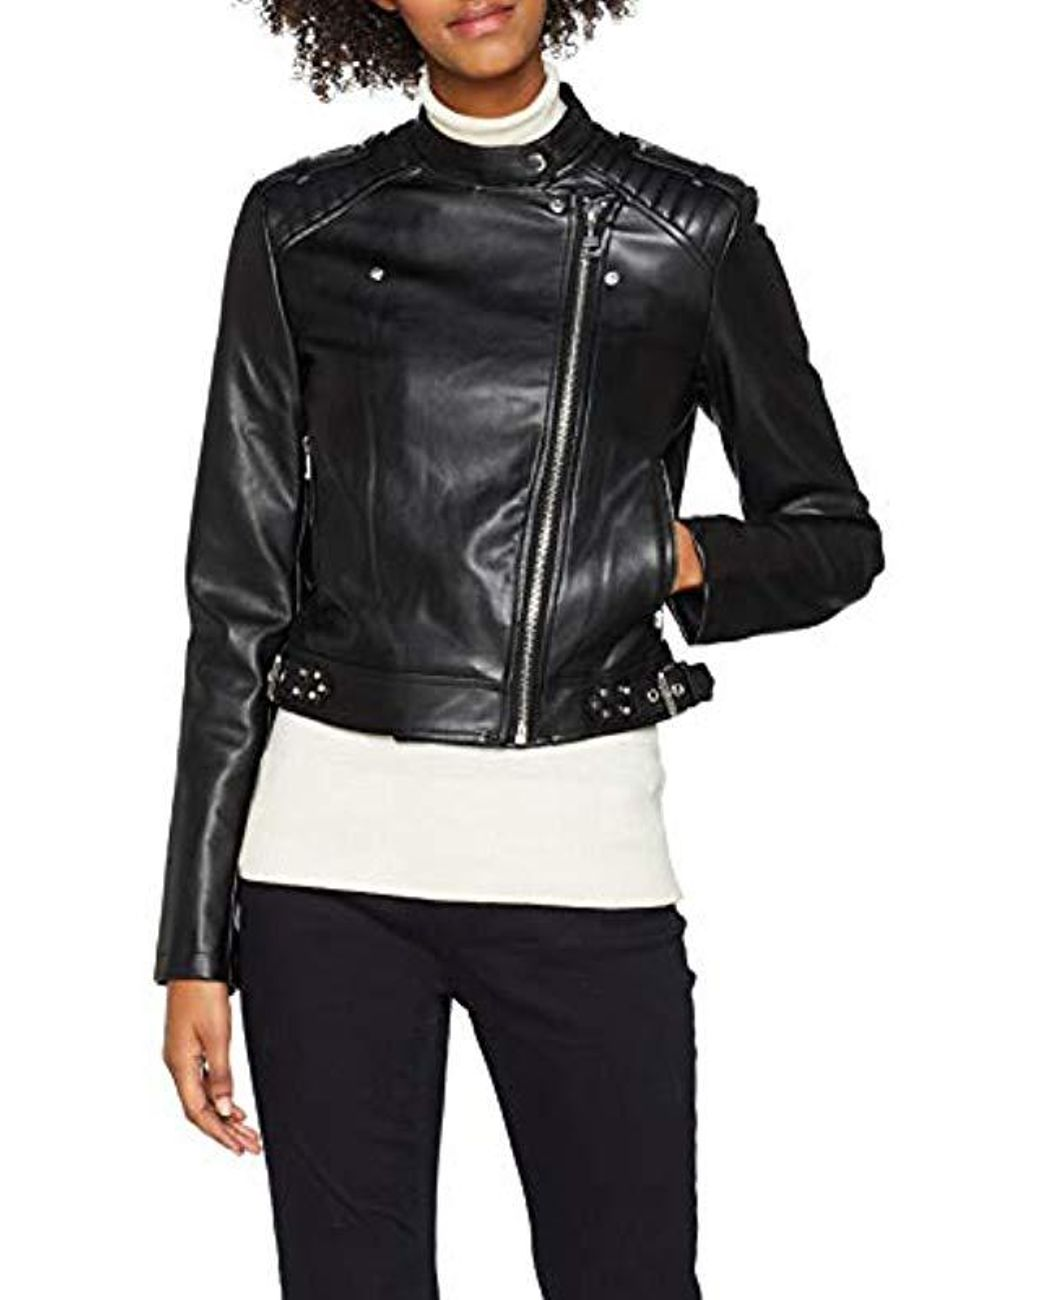 save off 40ad4 76b35 Women's Black Giubbotti Eleonora Jacket Coat